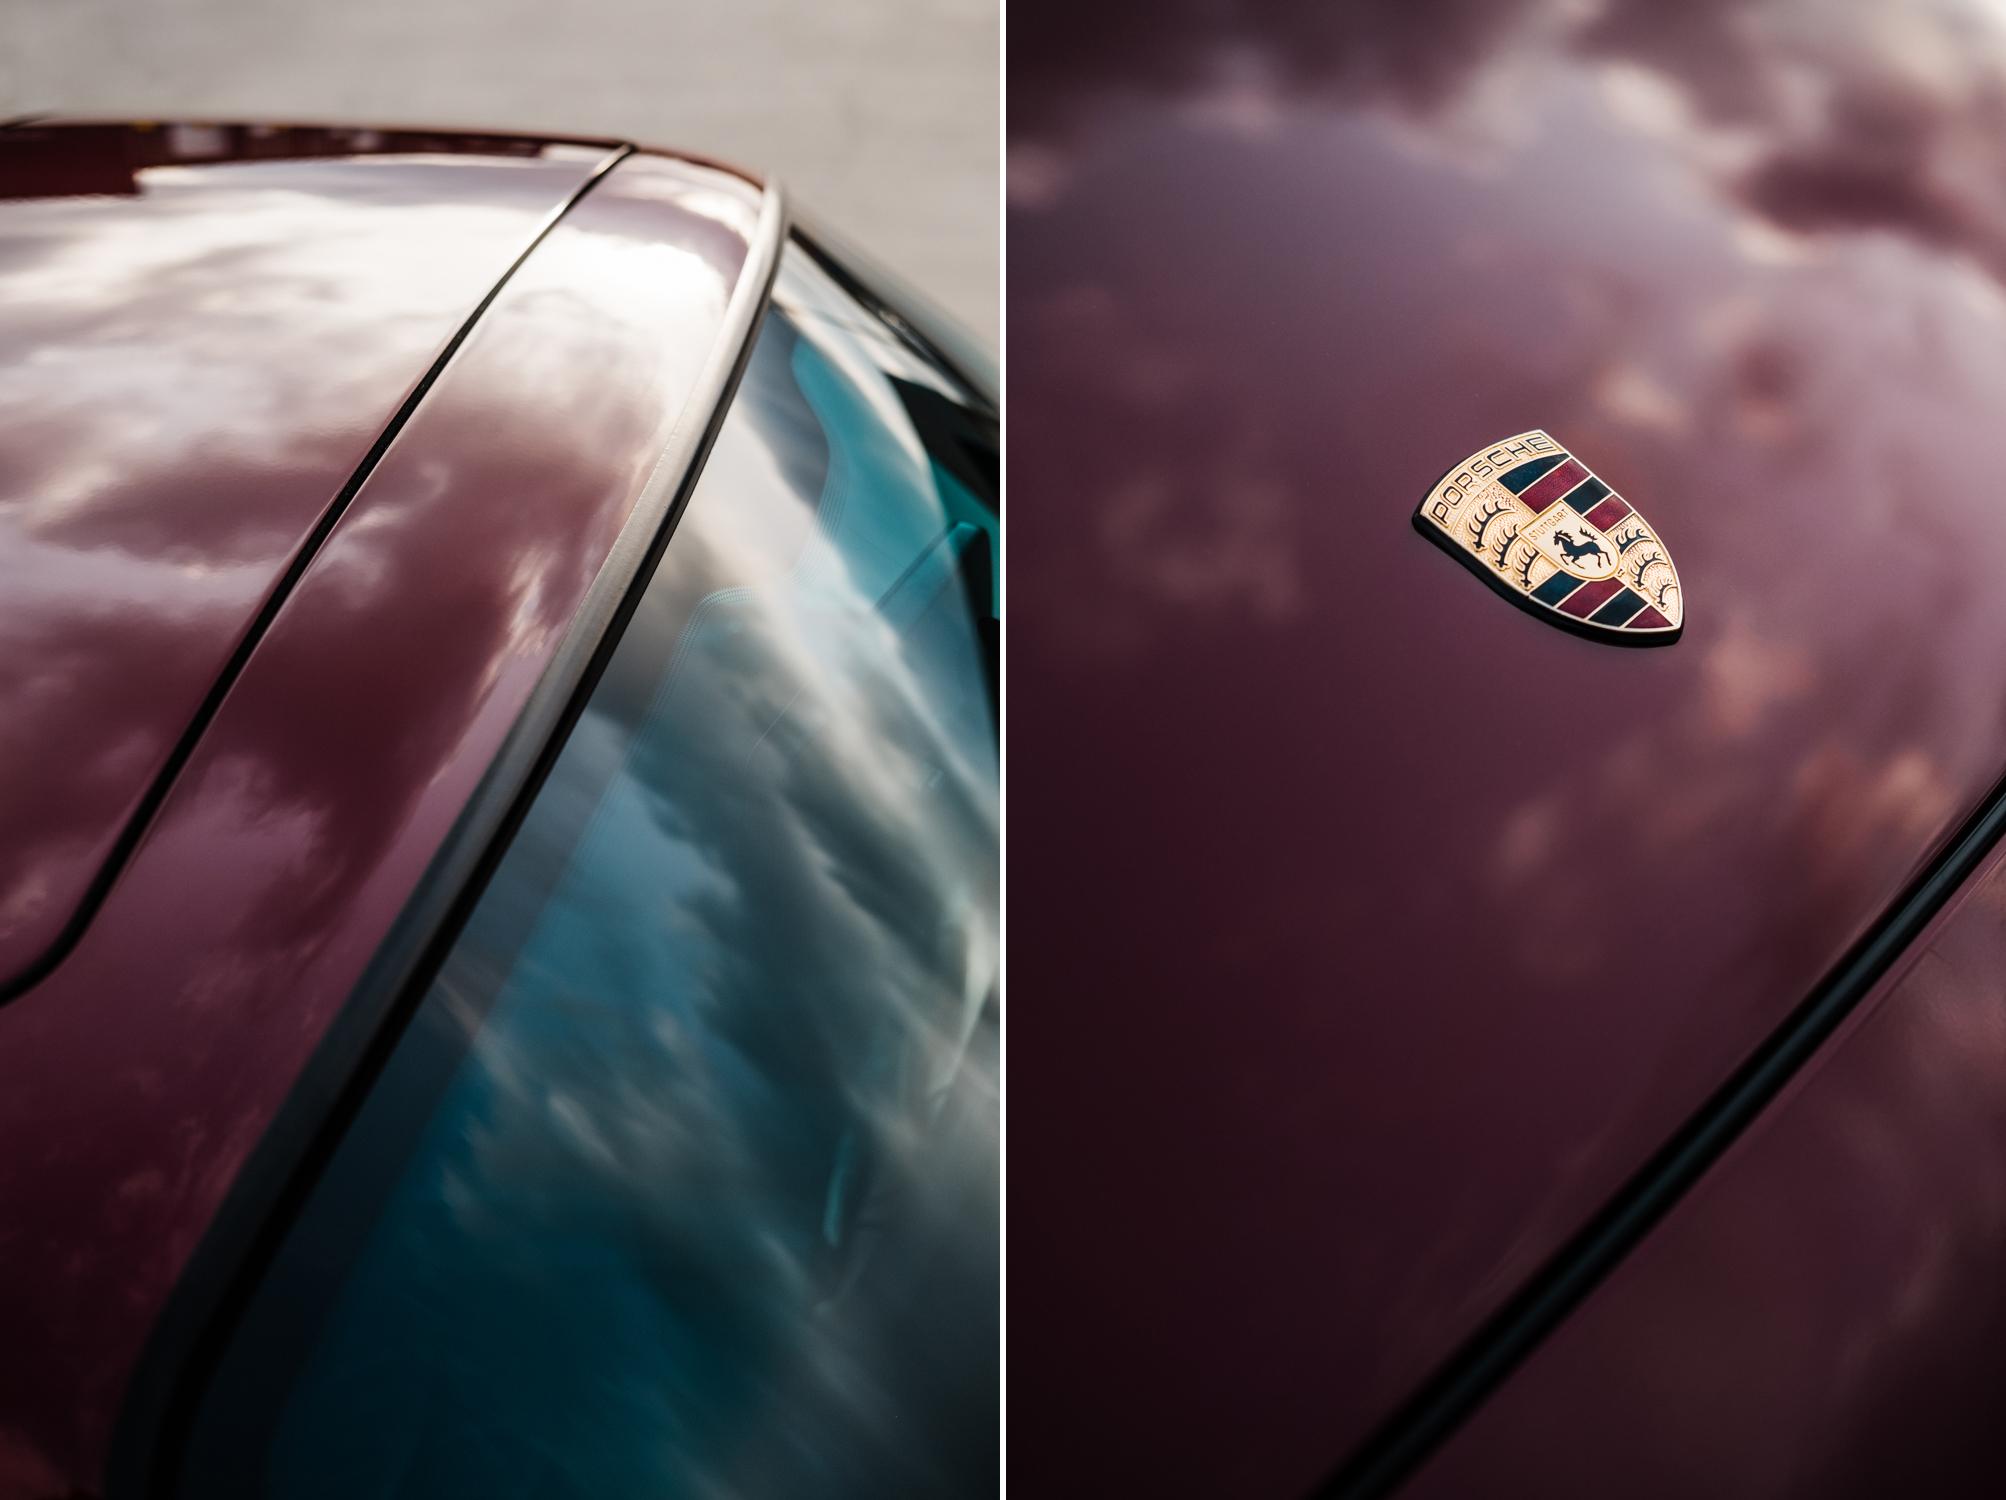 Porsche 911 Carrera 4S-Porsche 993-Porsche 911-Paint Correction-Car Wash-Car Detailing-215.jpg